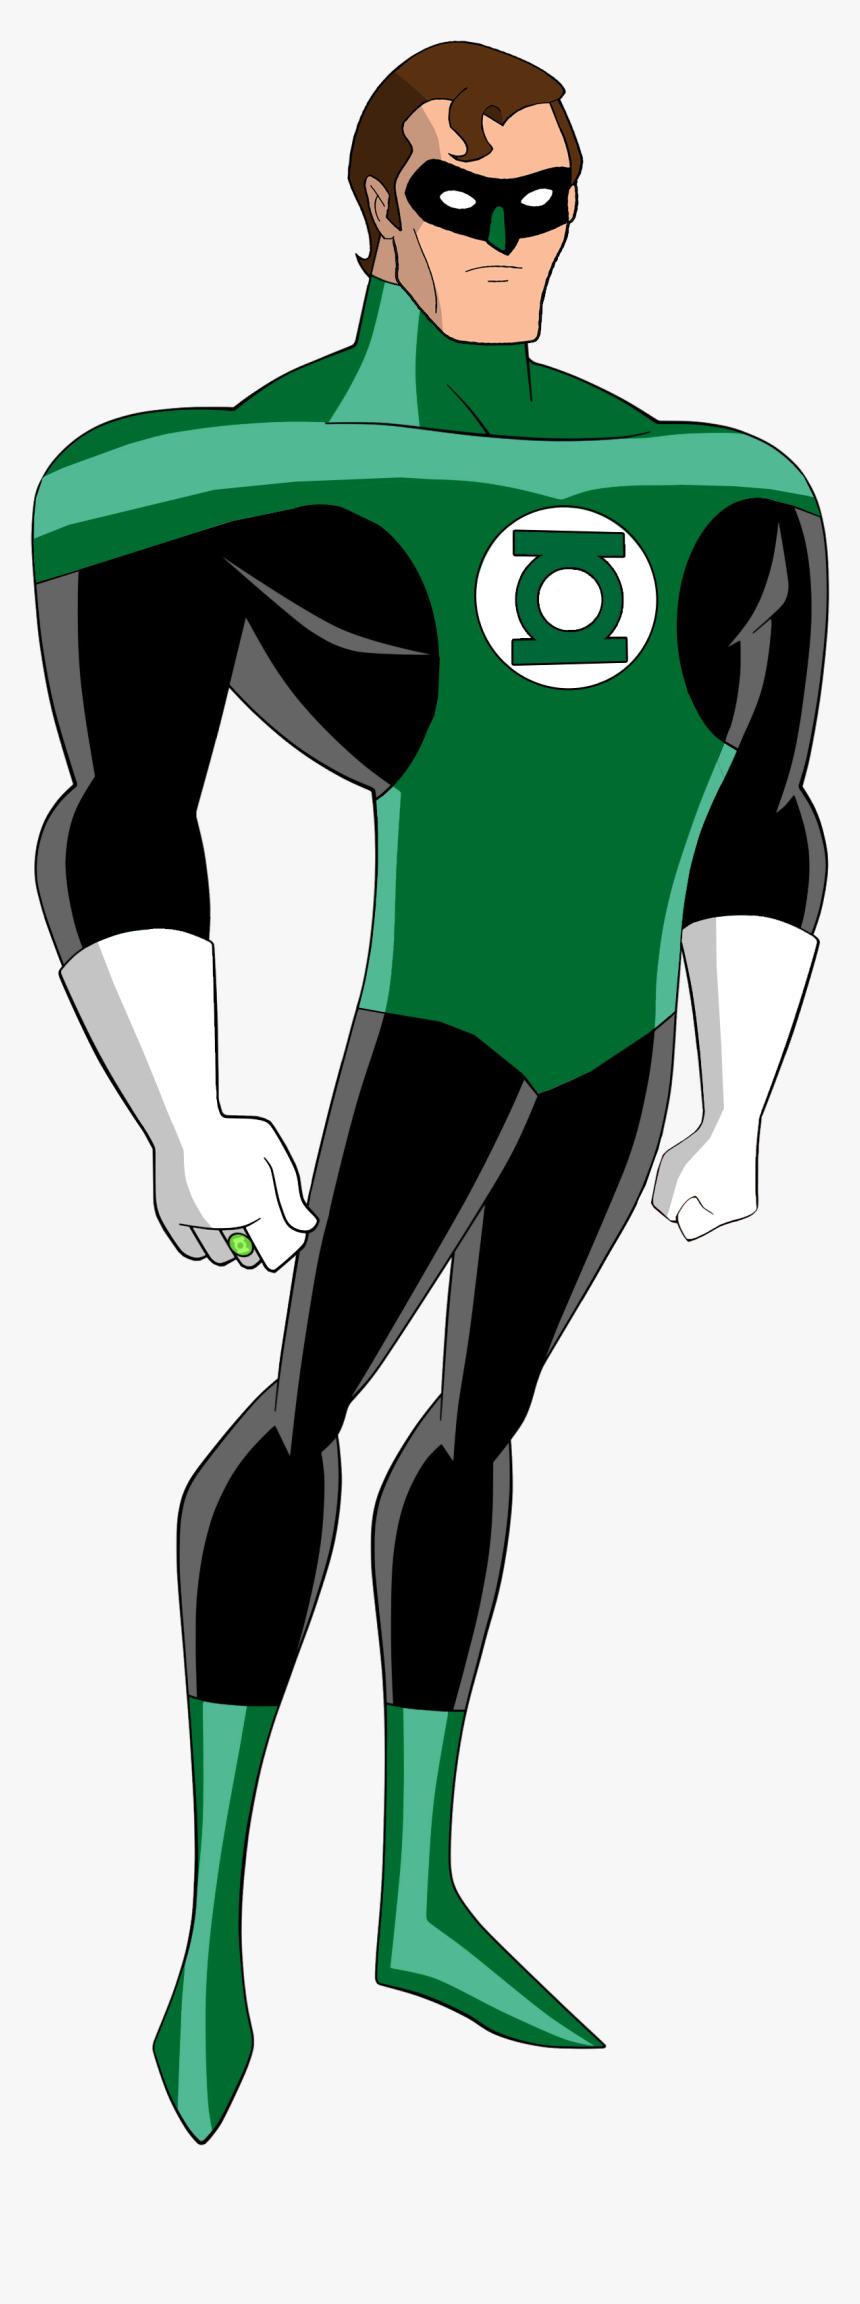 Justice League Tas Green Lantern, HD Png Download, Free Download